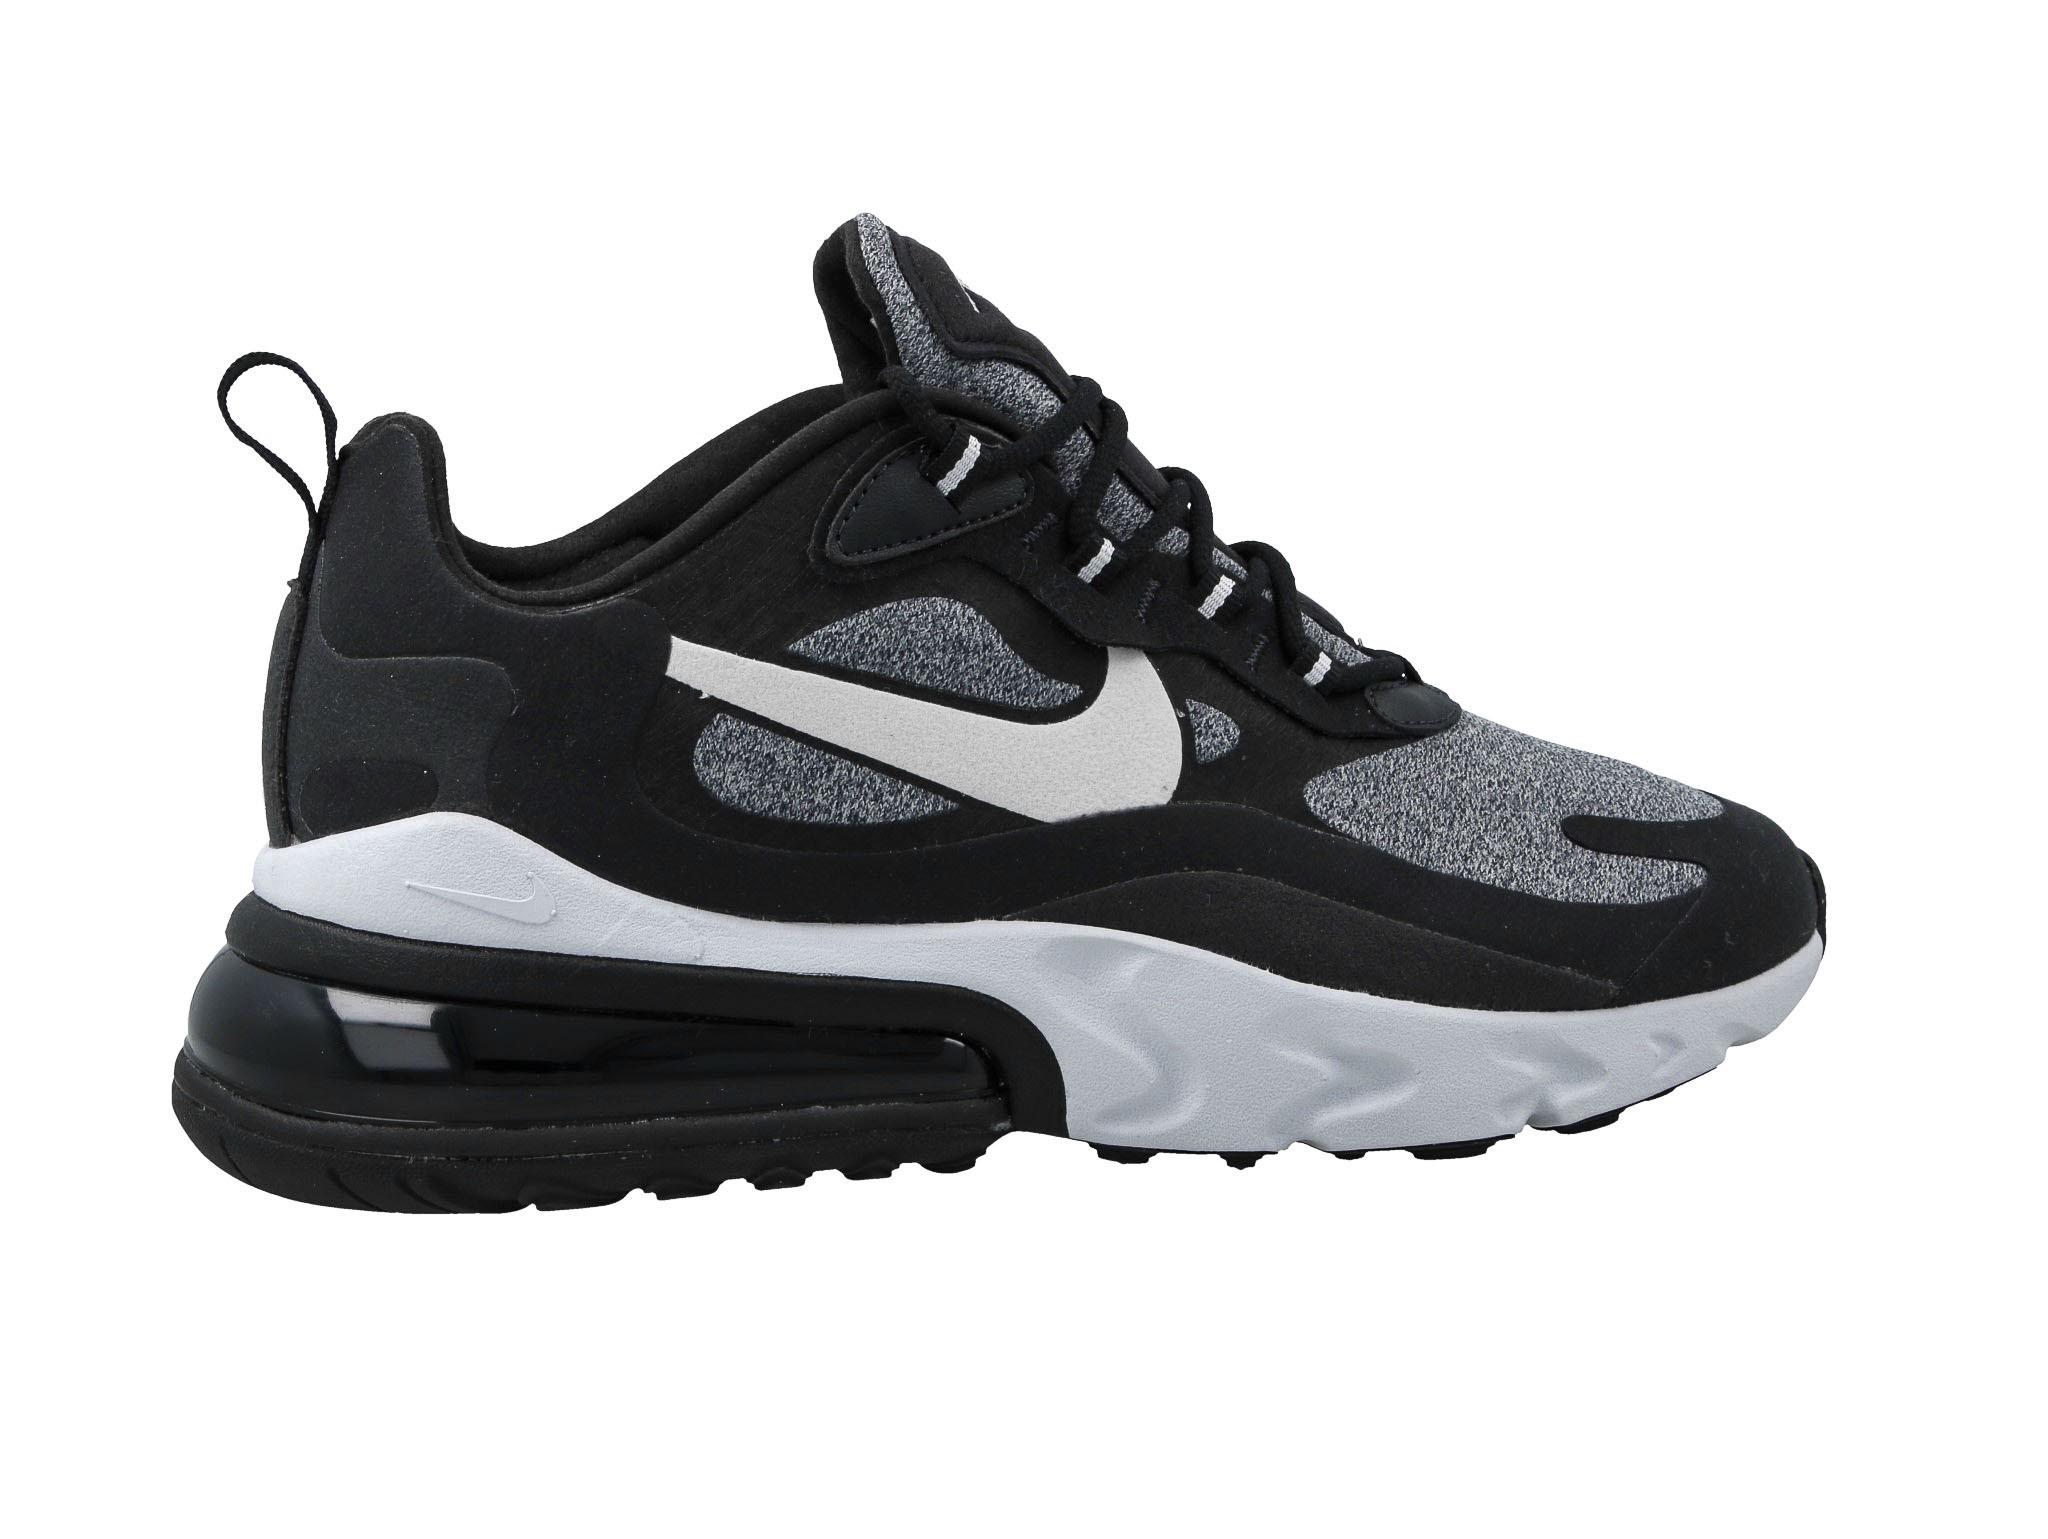 Nike Air Max 270 React Black White Brown AO4971 400